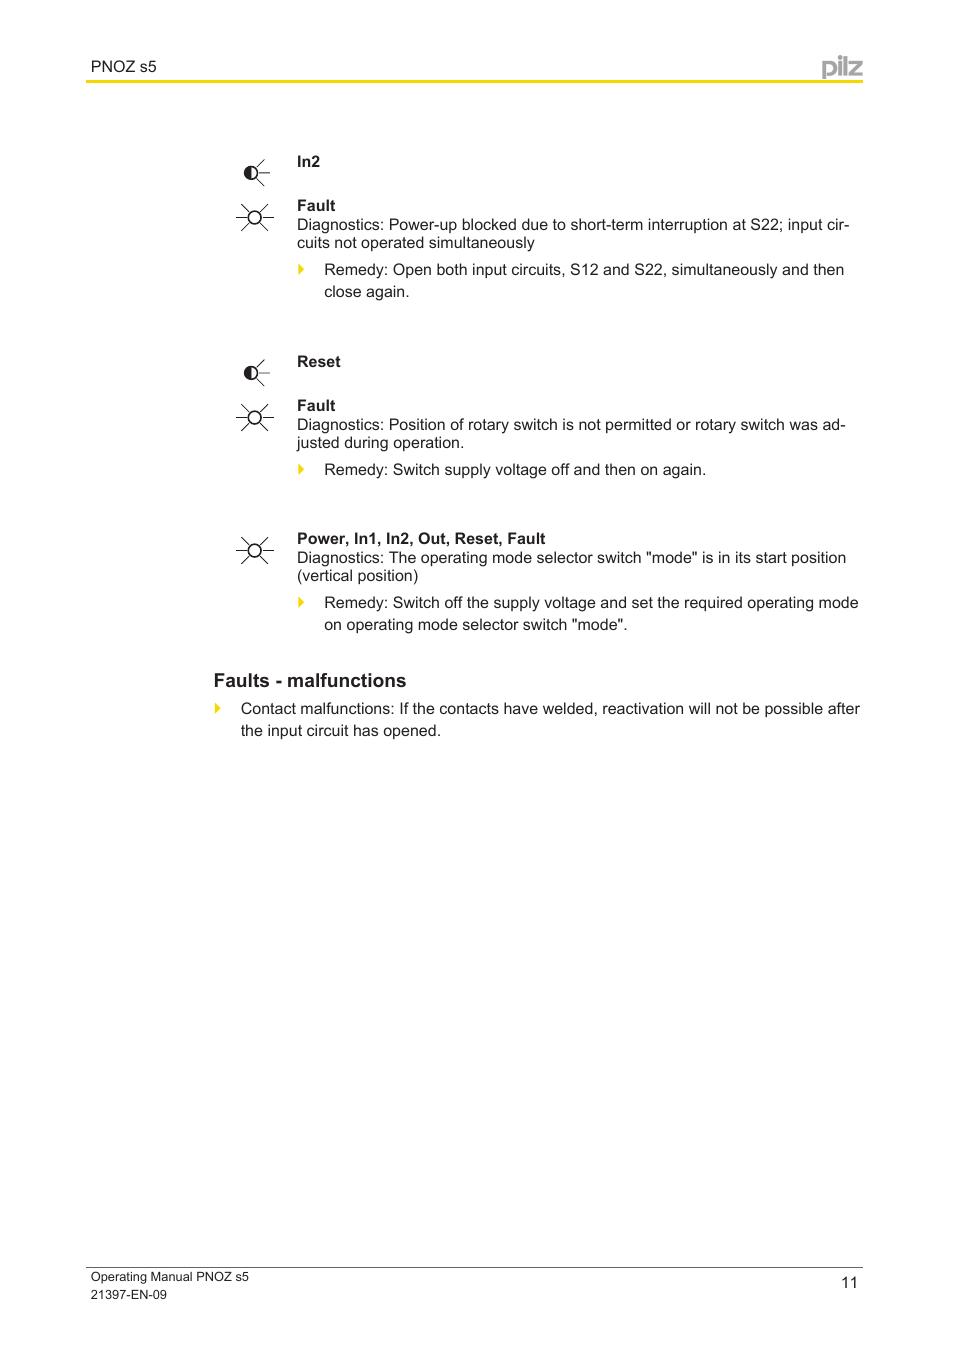 Error indicators   pilz pnoz s5 c 24vdc 2 n/o 2 n/o t coated user.